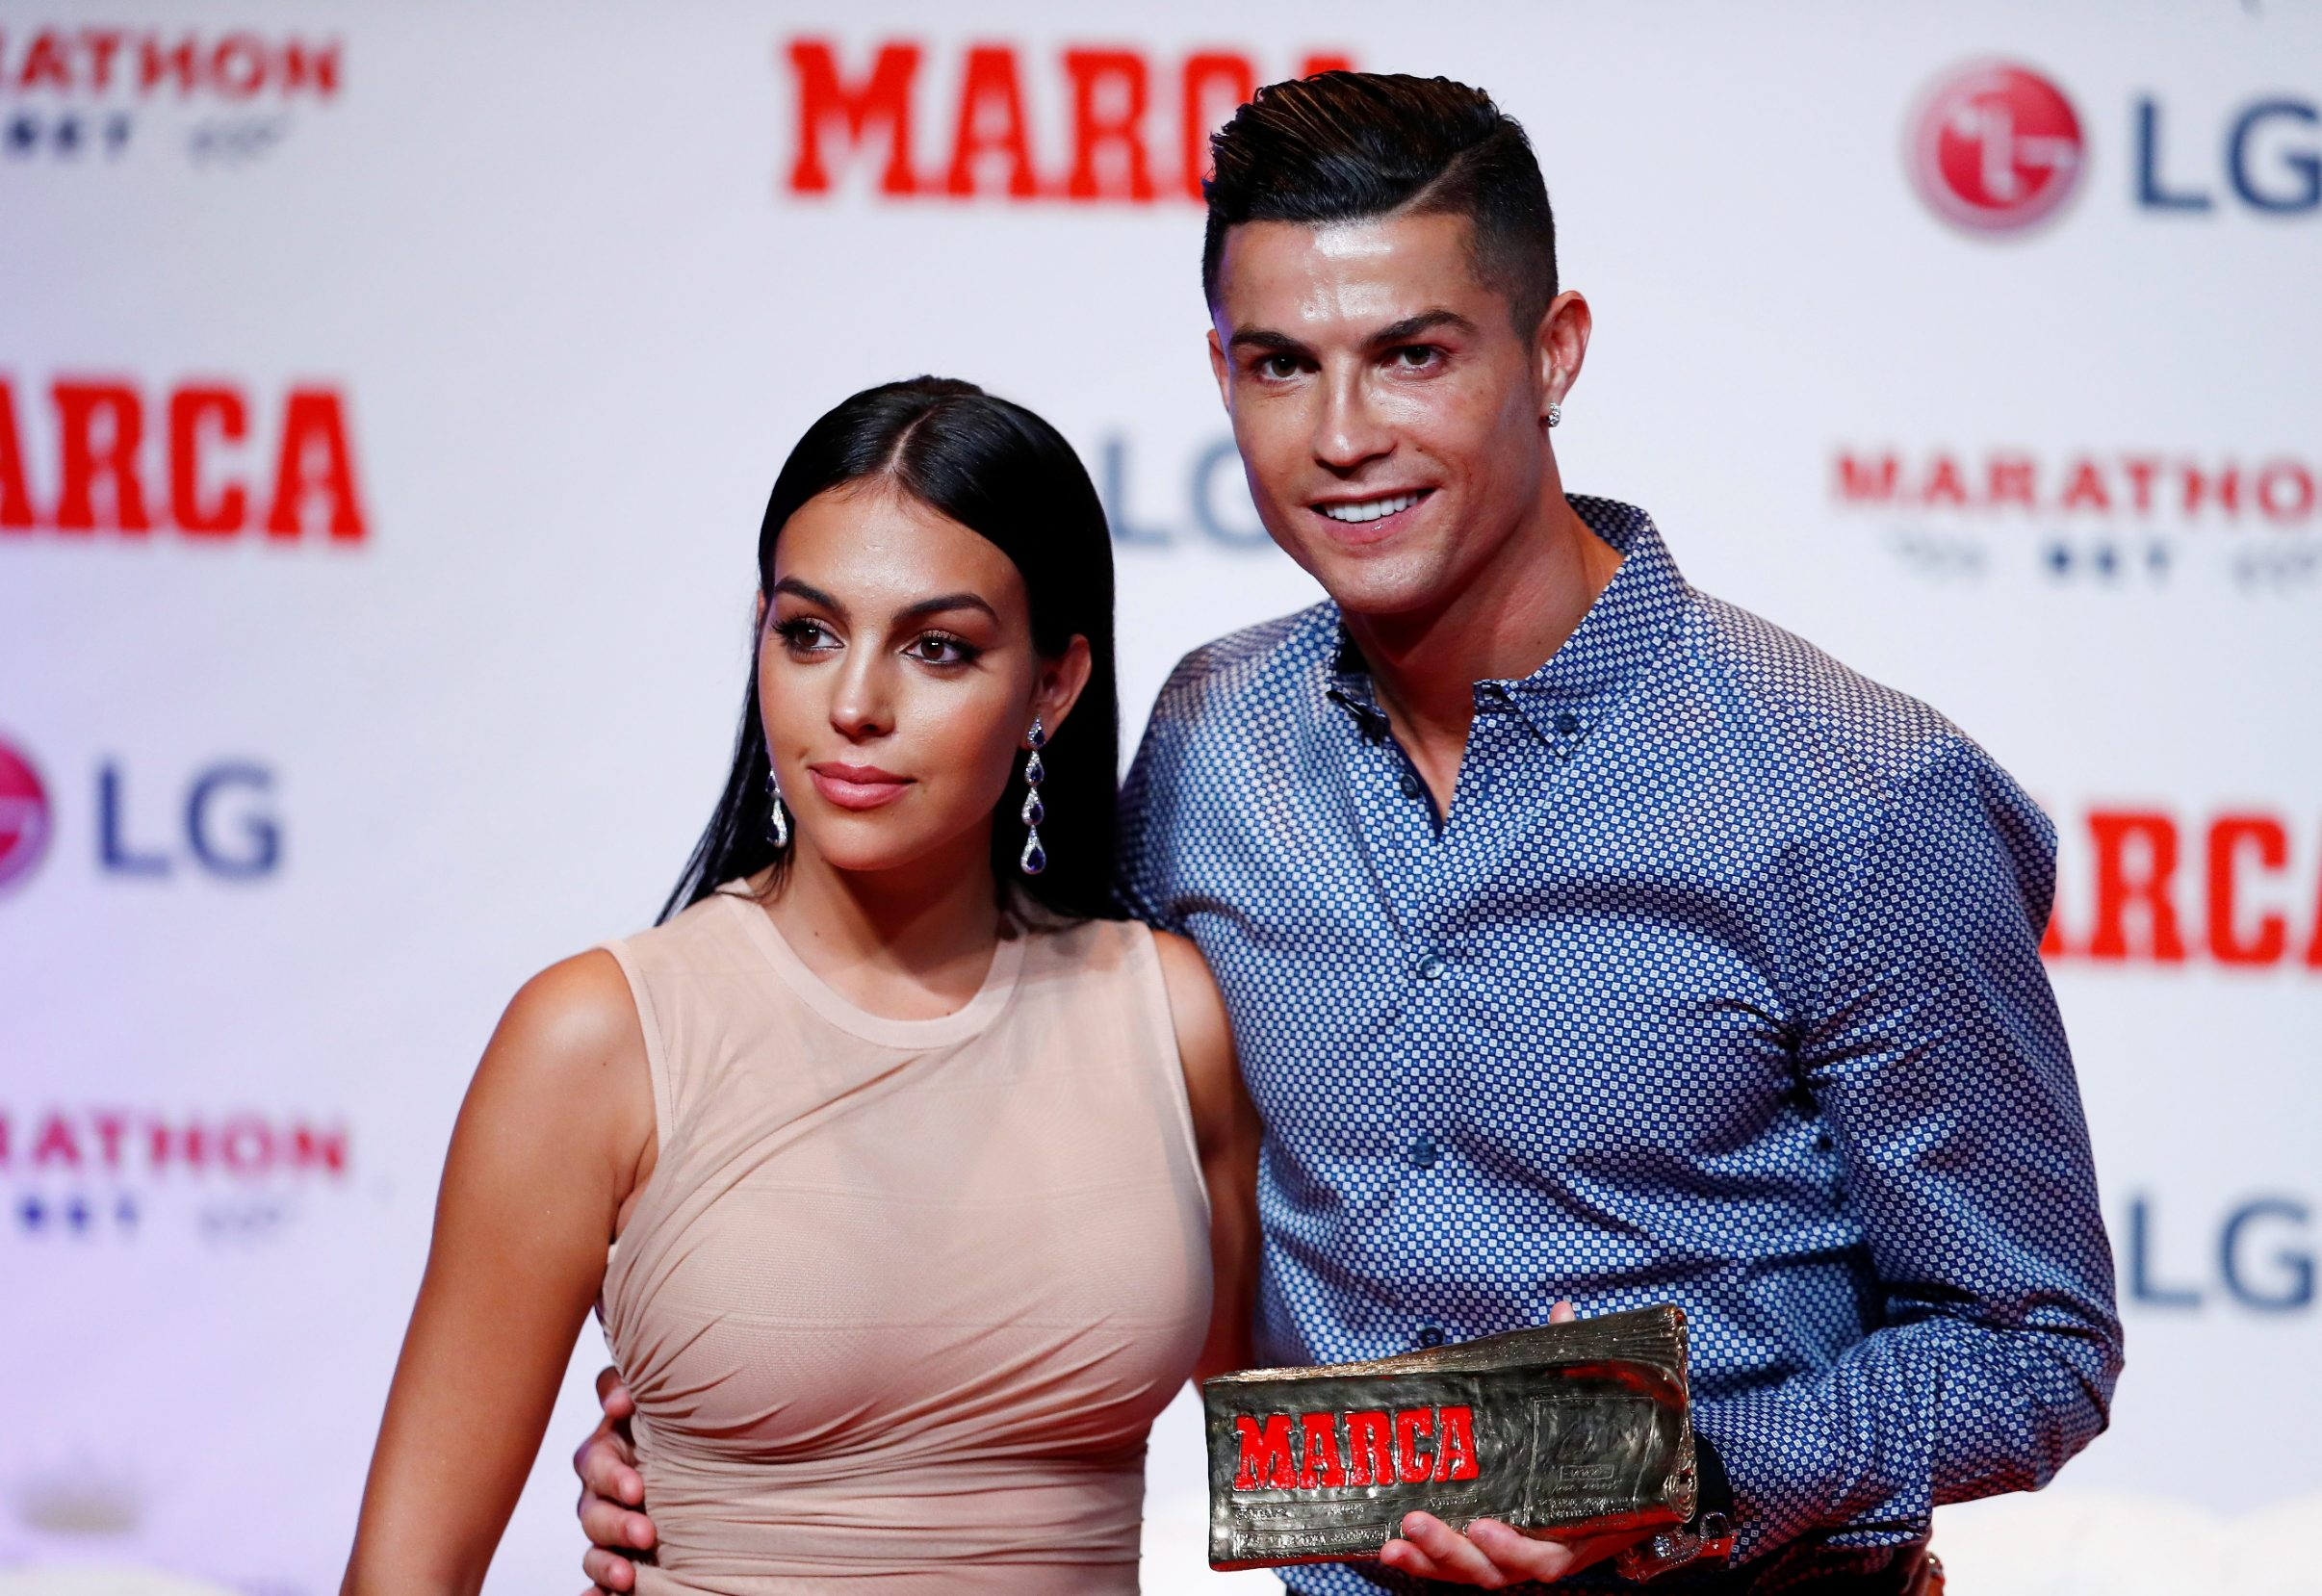 Soccer Football - Cristiano Ronaldo receives the MARCA Legend award - Reina Victoria Theater, Madrid, Spain - July 29, 2019   Cristiano Ronaldo poses with partner Georgina Rodriguez and the MARCA Legend award   REUTERS/Juan Medina